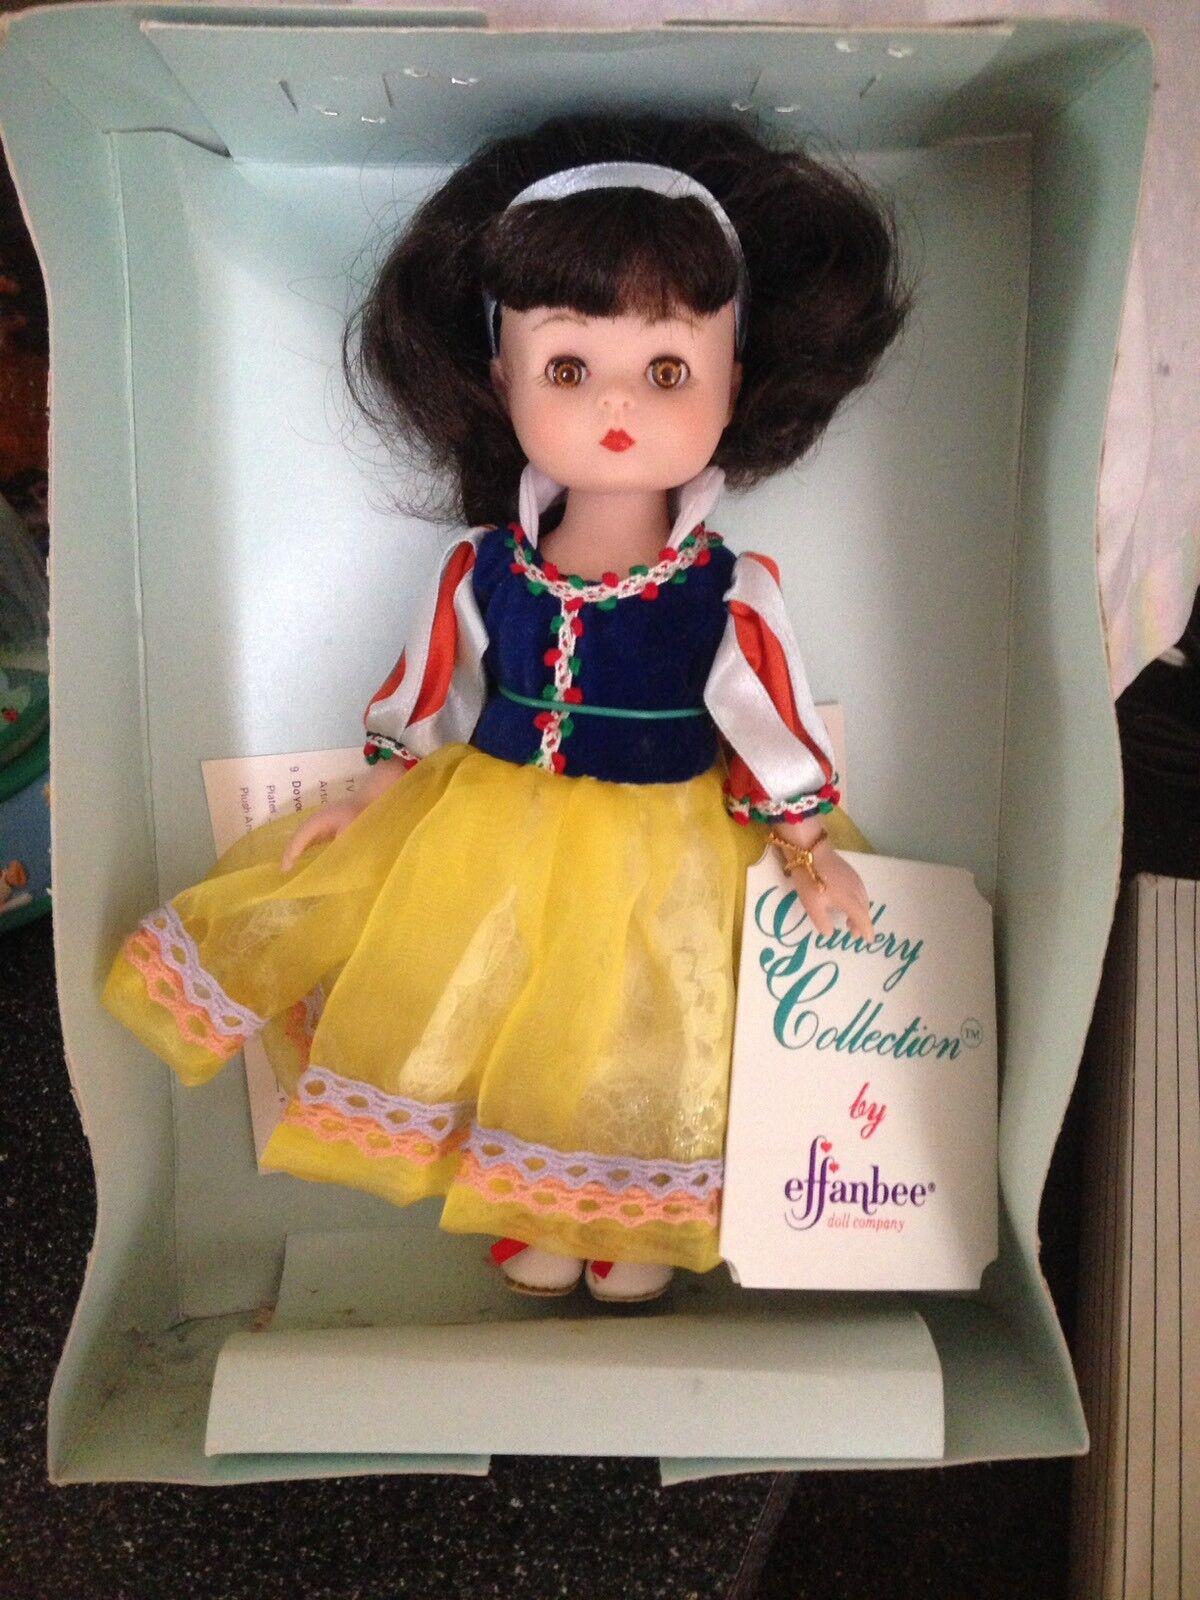 1992 Effanbee Doll Company Historia Libro Serie MV105 retirado Rara Muñeca blancoanieves